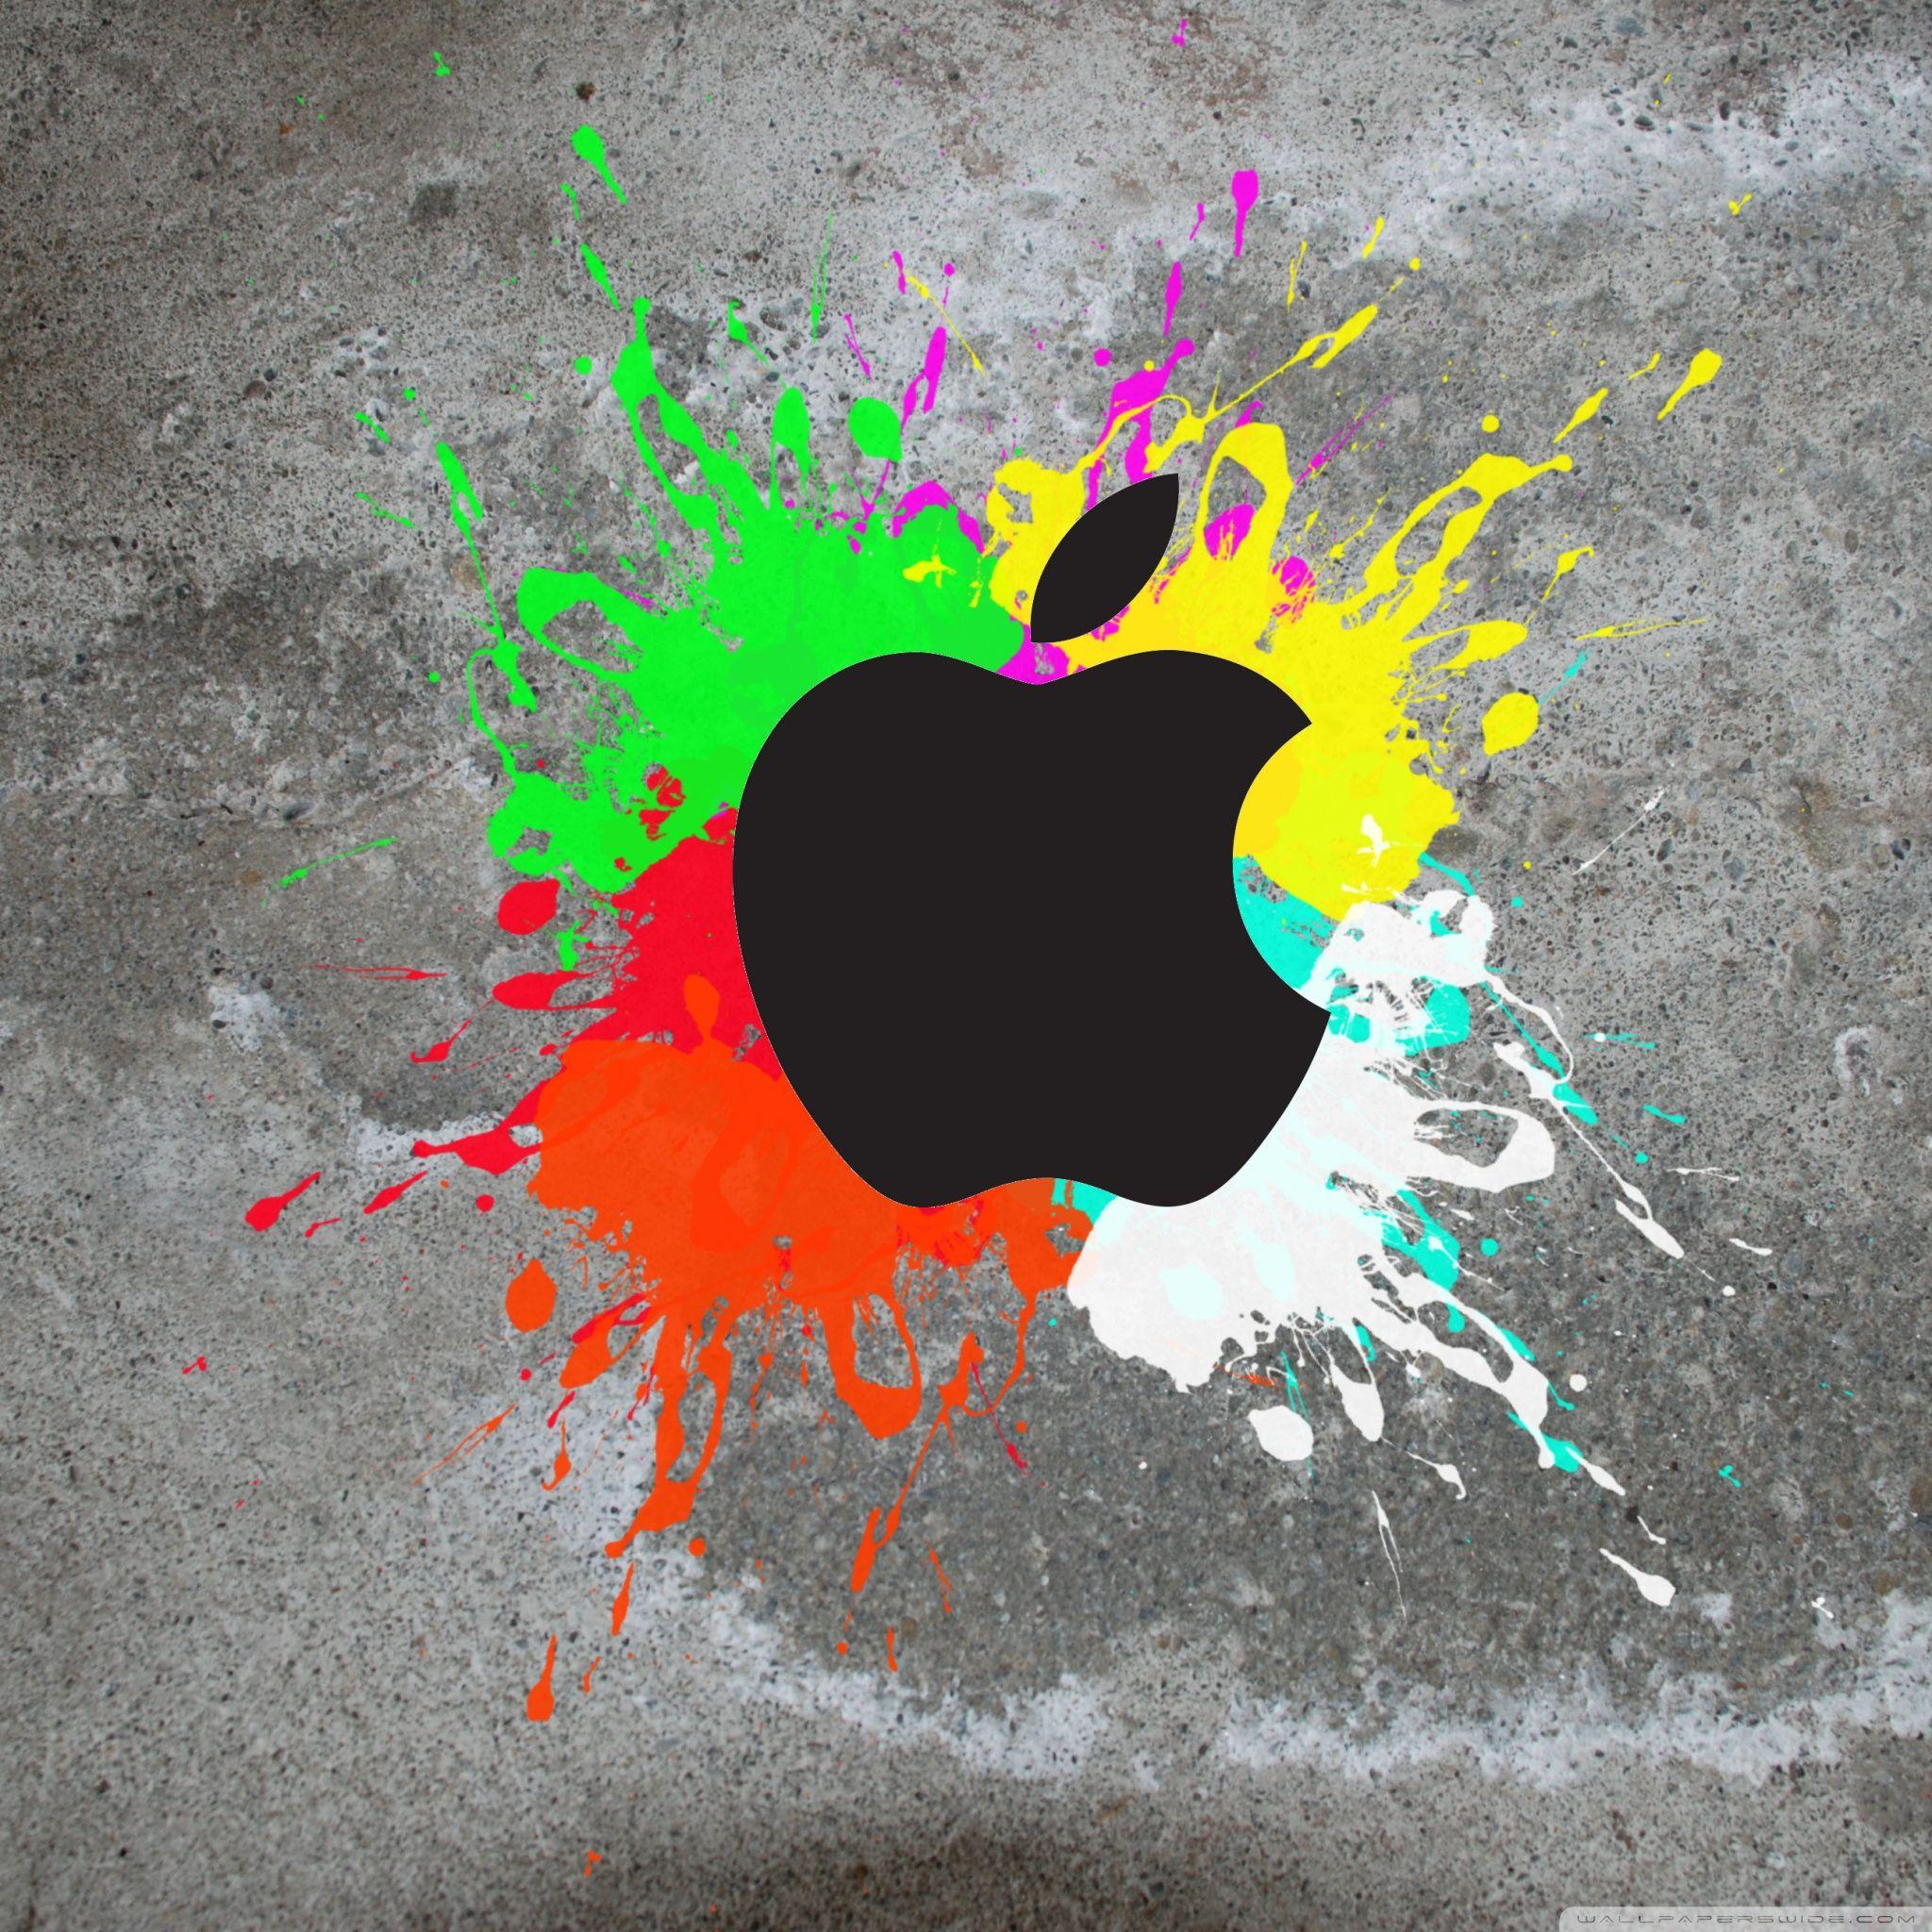 Colorful apple hd desktop wallpaper widescreen high definition colorful apple hd desktop wallpaper widescreen high definition voltagebd Choice Image